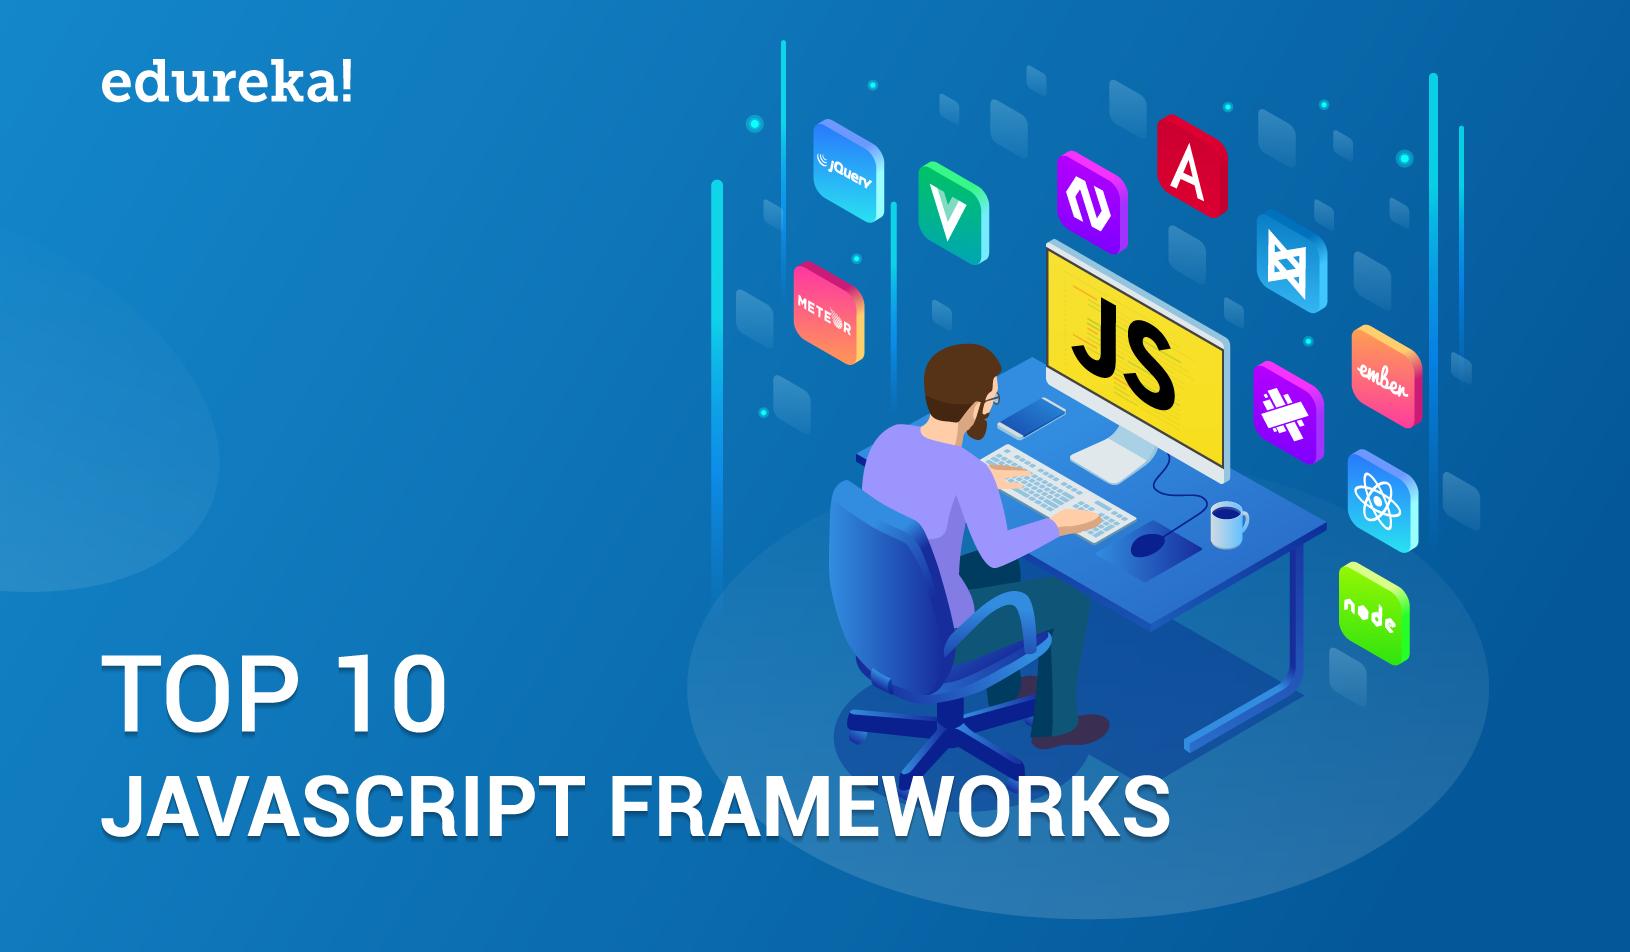 Top 10 Most Popular JavaScript Frameworks for Web Development   Edureka